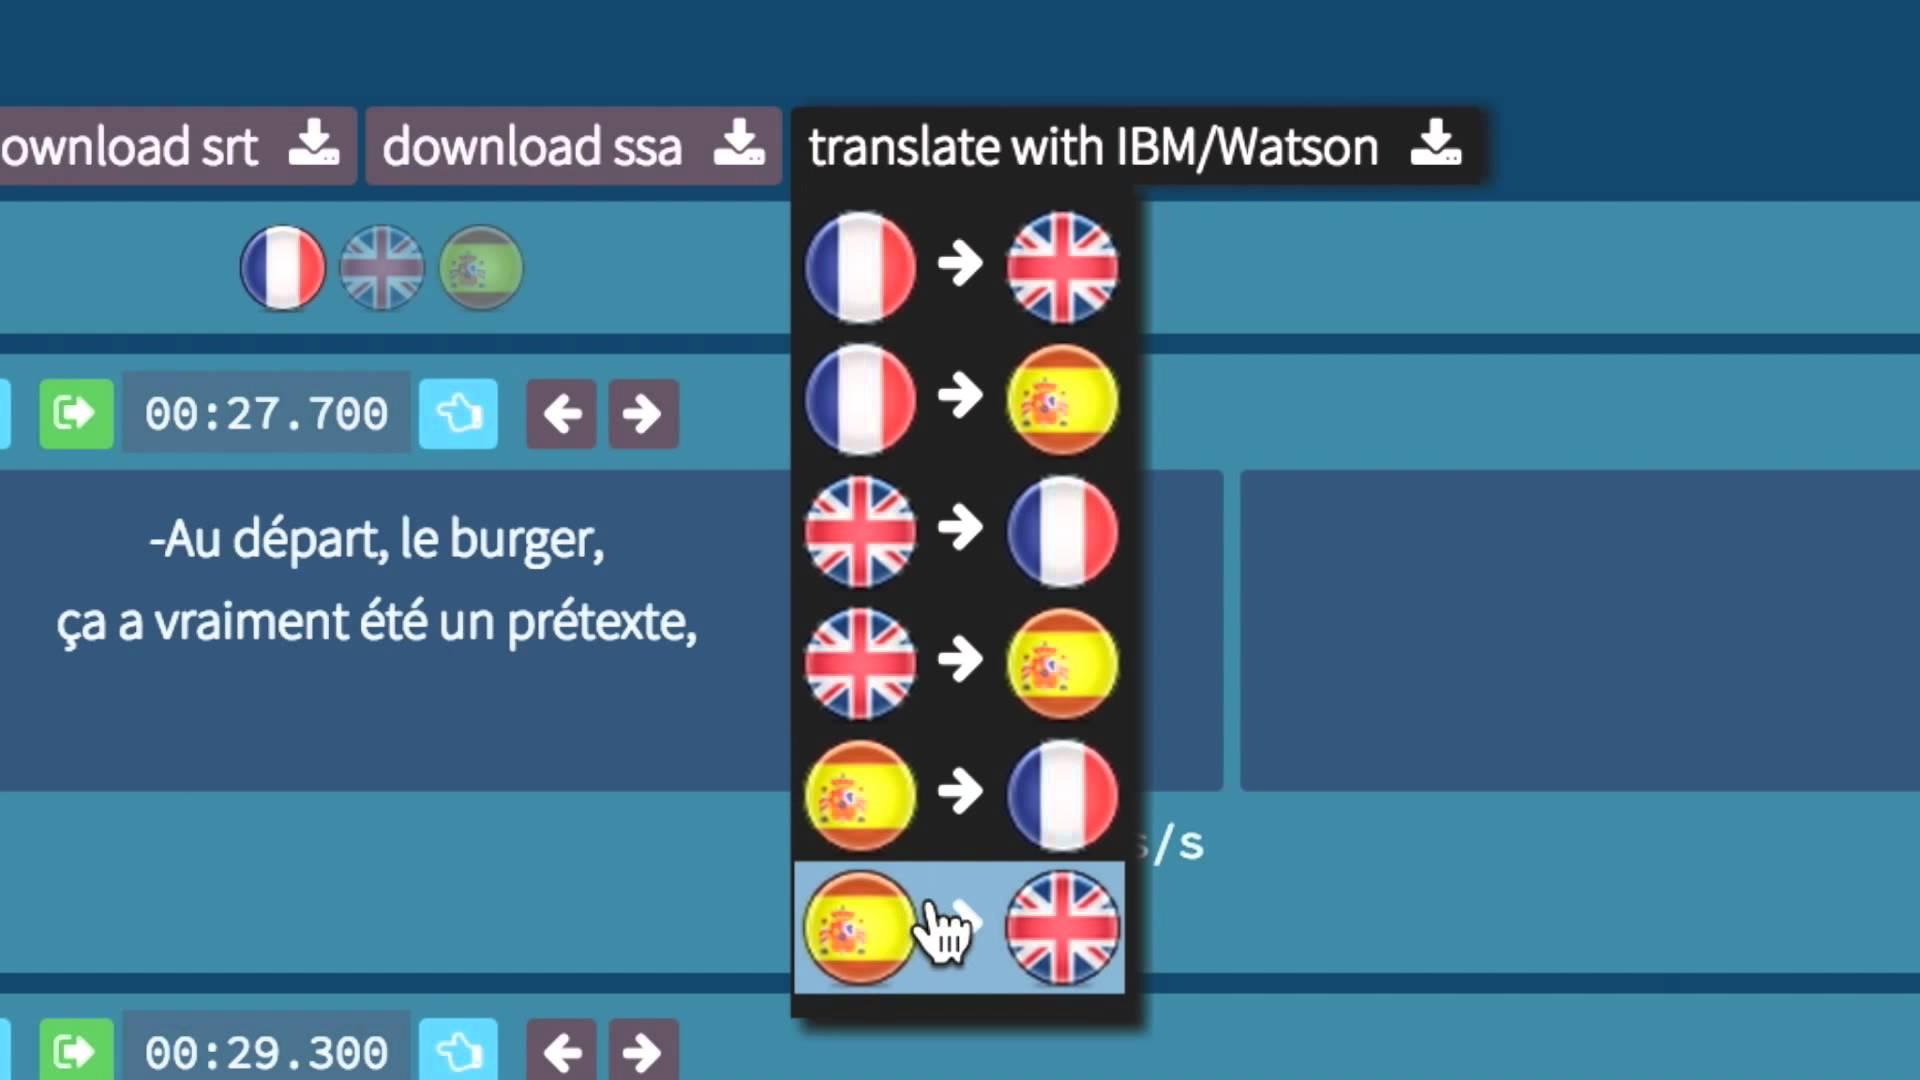 IBM Control Desk translates with IBM Watson